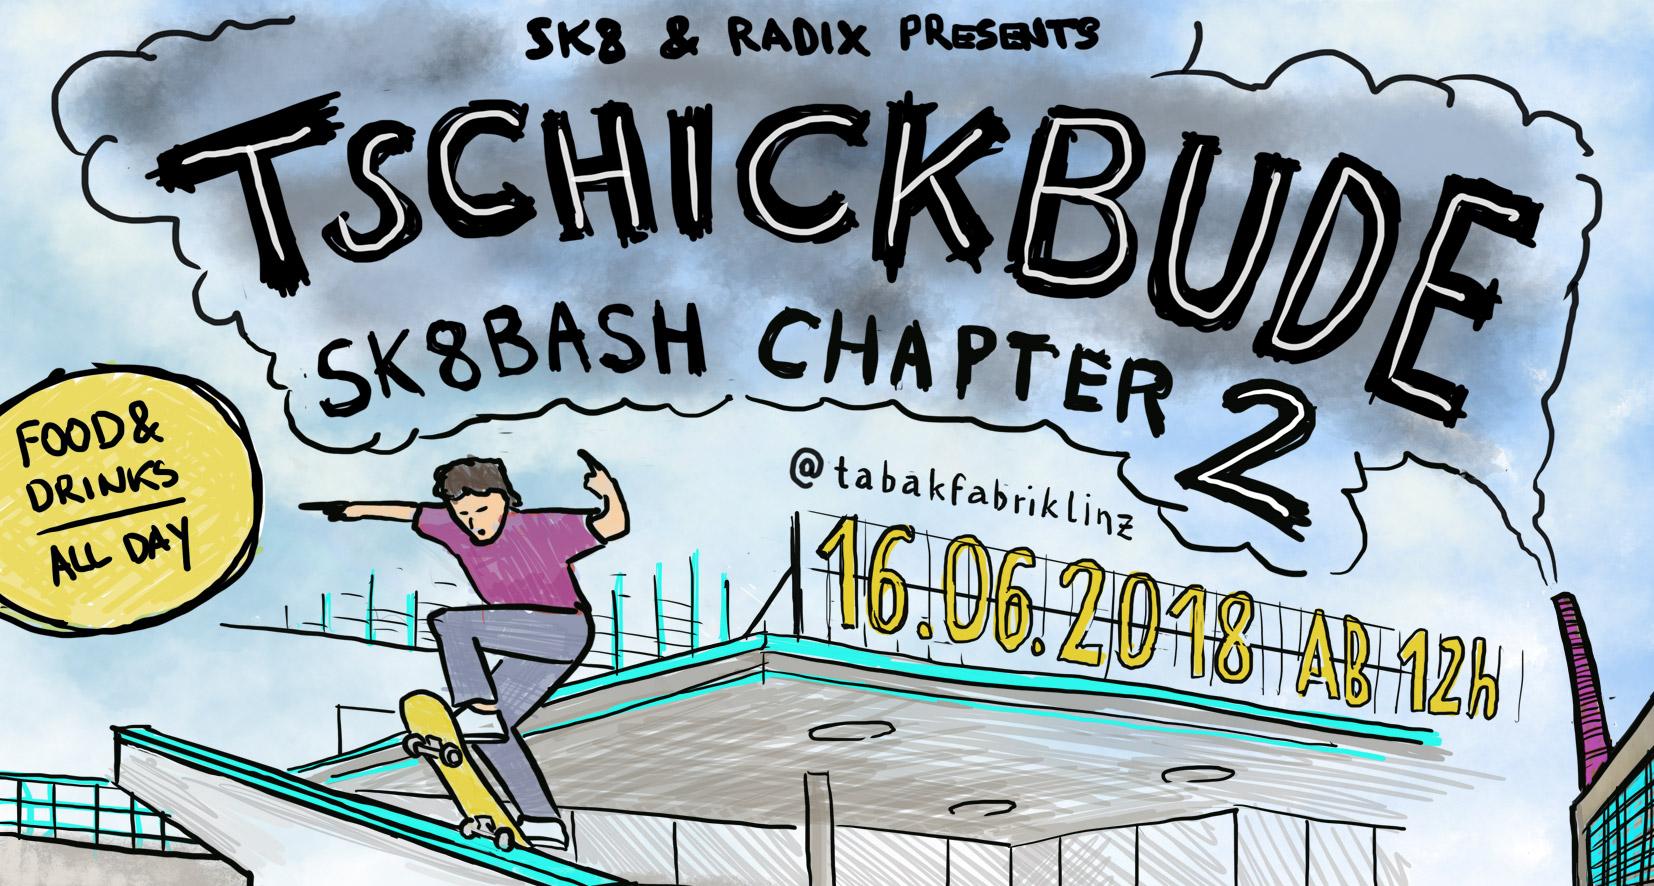 2018_tschickbude_skatebash_facebook_veranstaltung